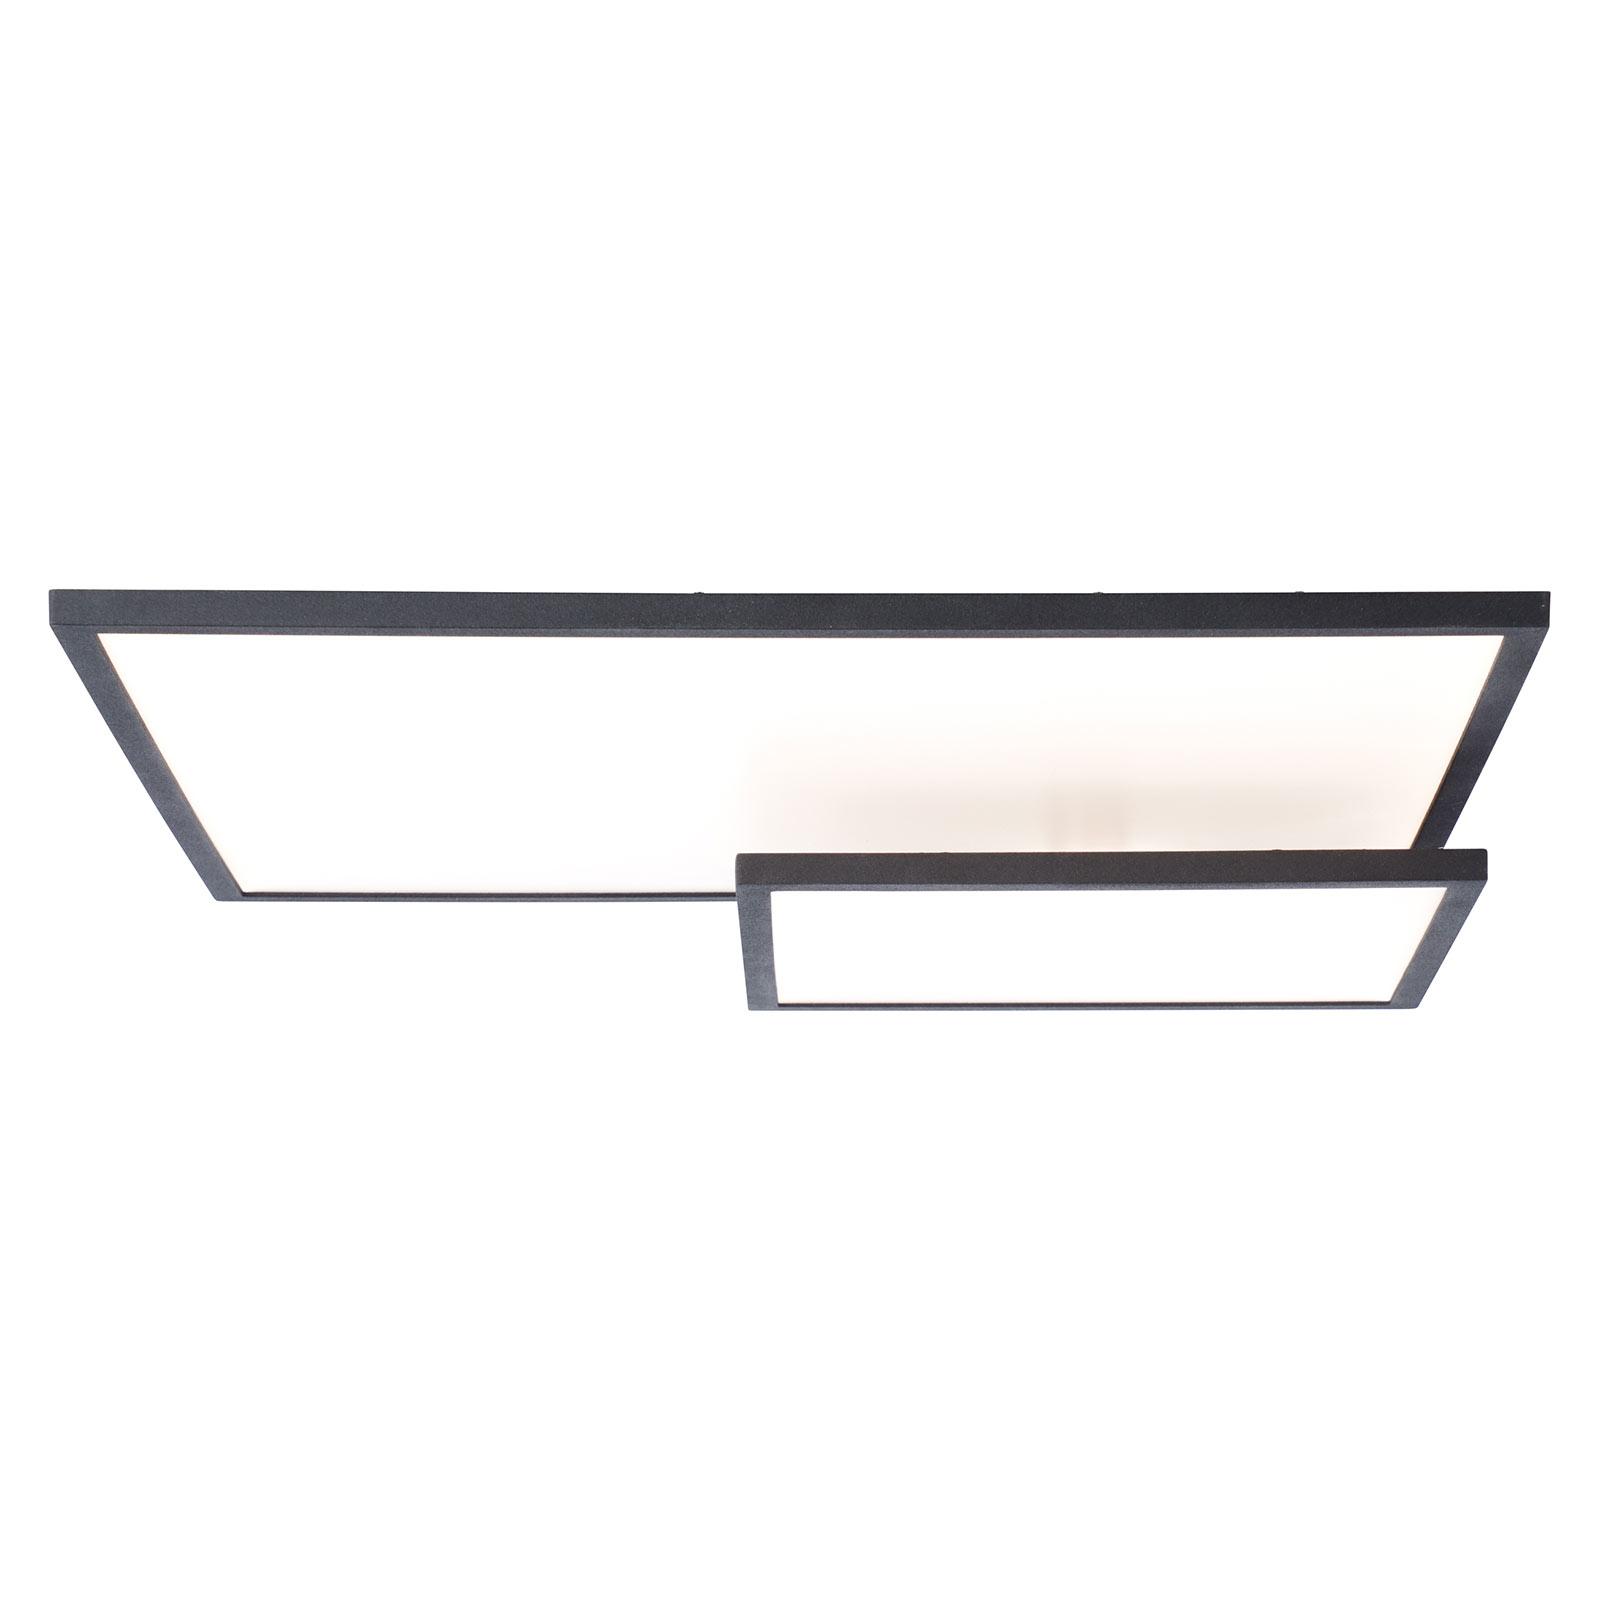 LED-taklampa Bility, längd 62 cm ram svart